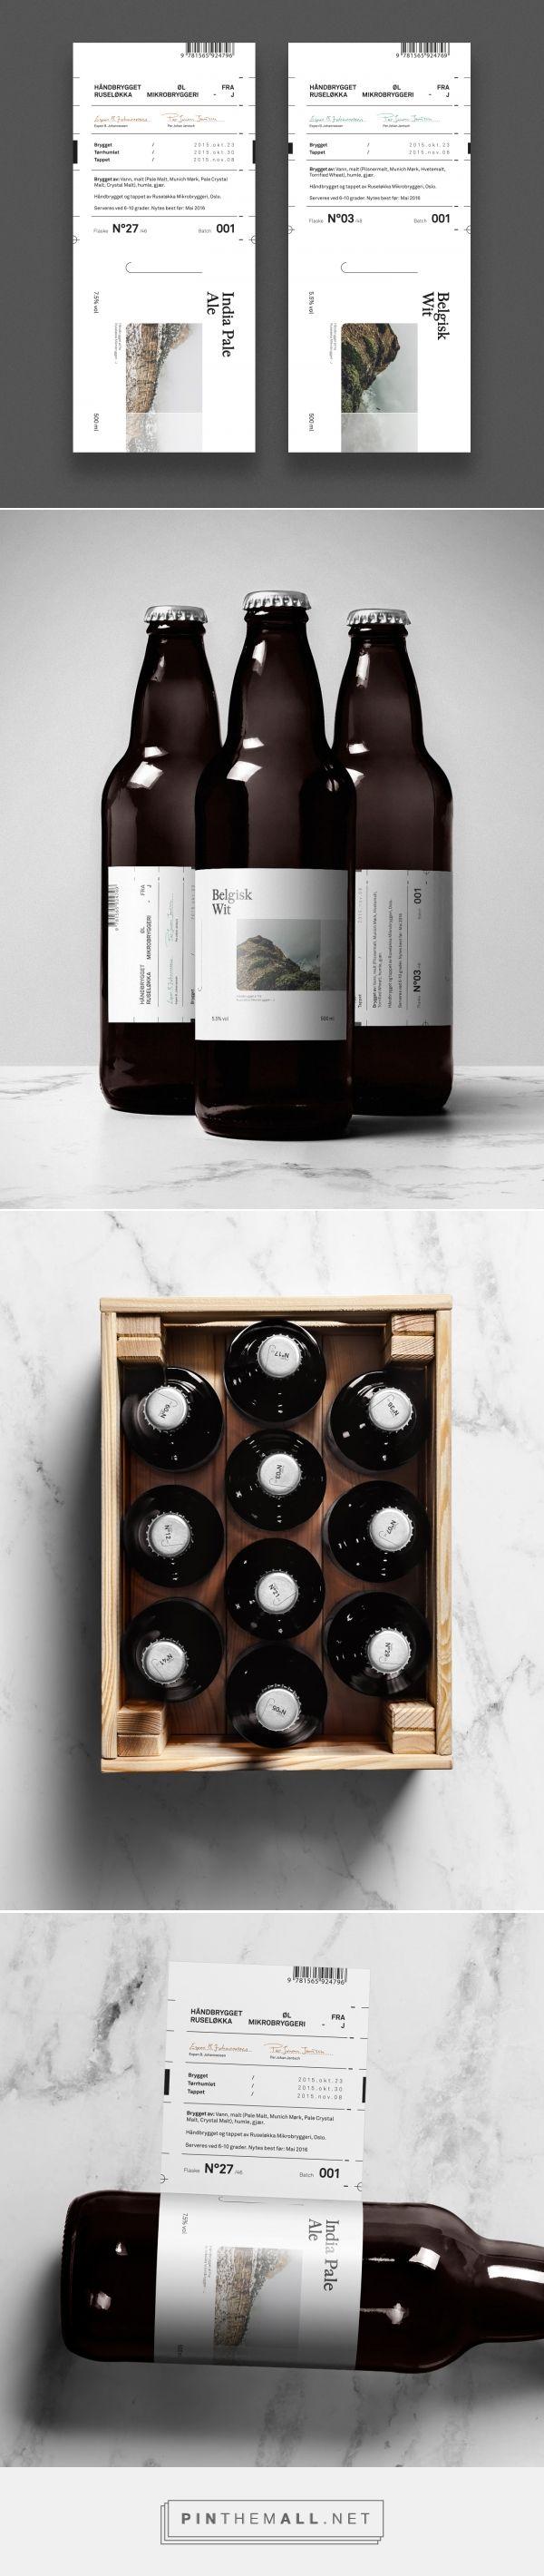 Ruseløkka Microbrewery beer label design by Nicklas Hellborg - http://www.packagingoftheworld.com/2016/11/ruselkka-microbrewery-concept.html